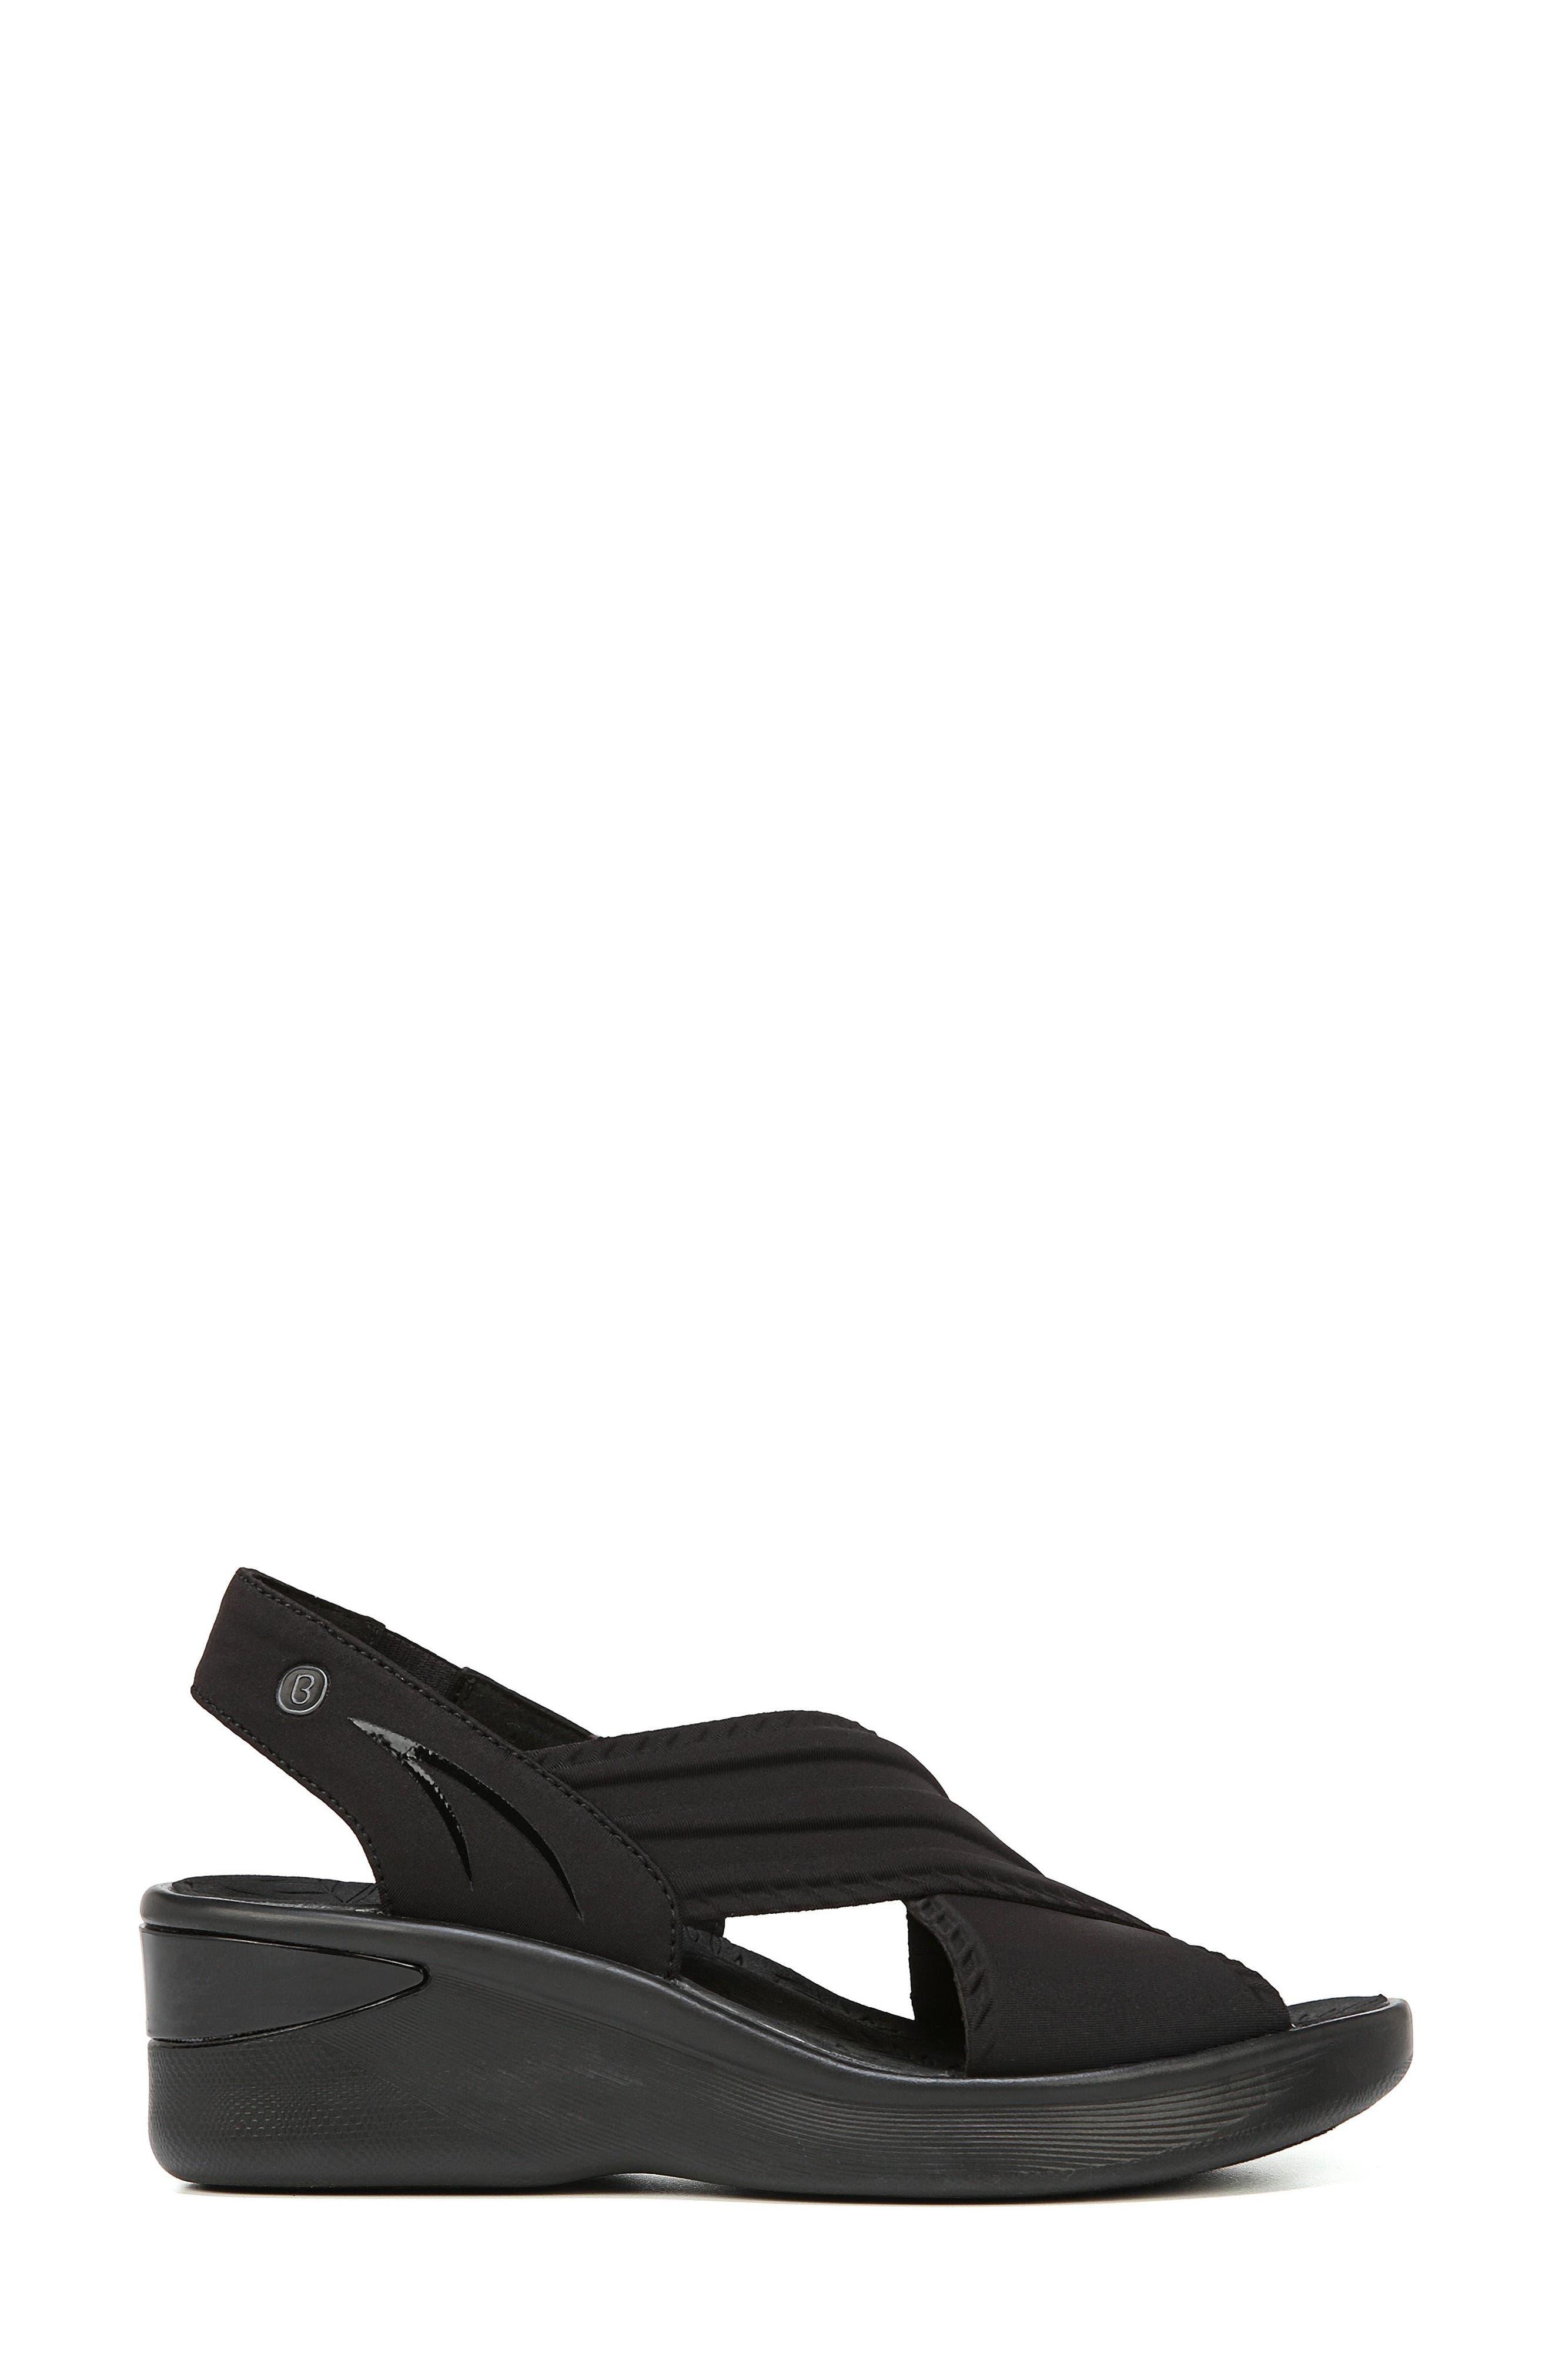 Sunset Wedge Sandal,                             Alternate thumbnail 3, color,                             BLACK FABRIC